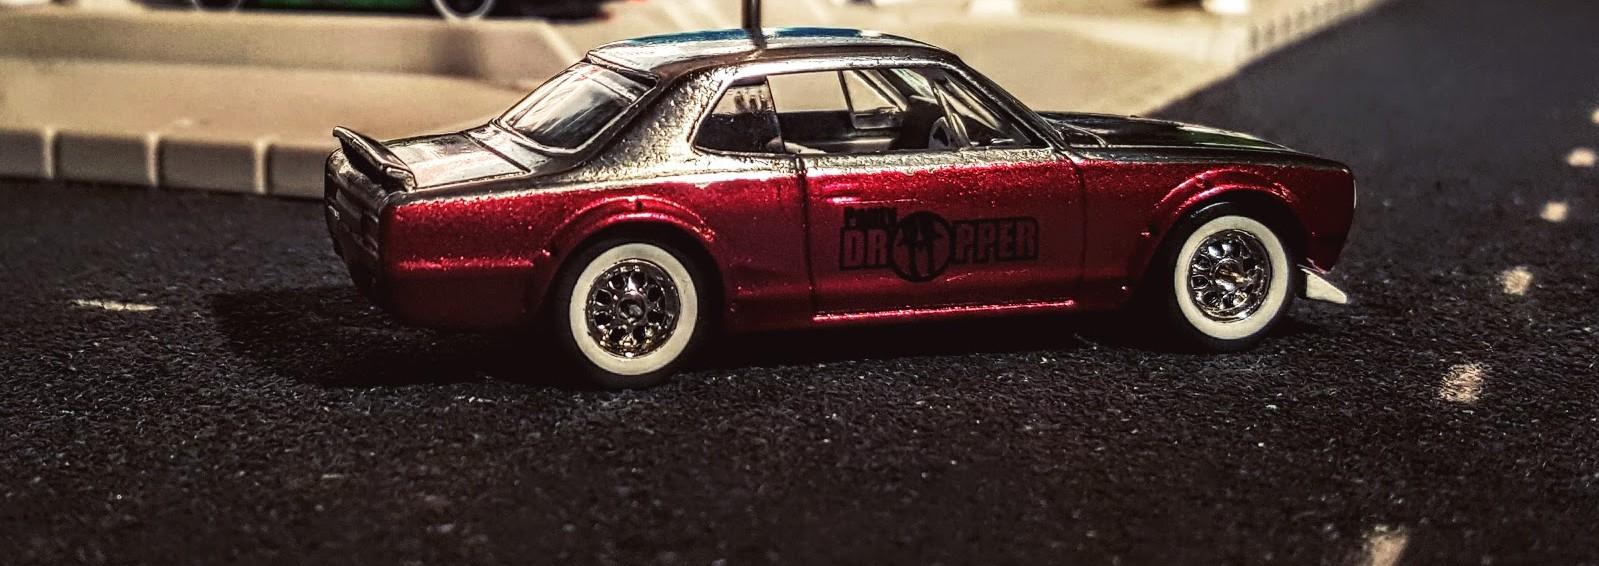 How To Strip & Polish Diecast Cars